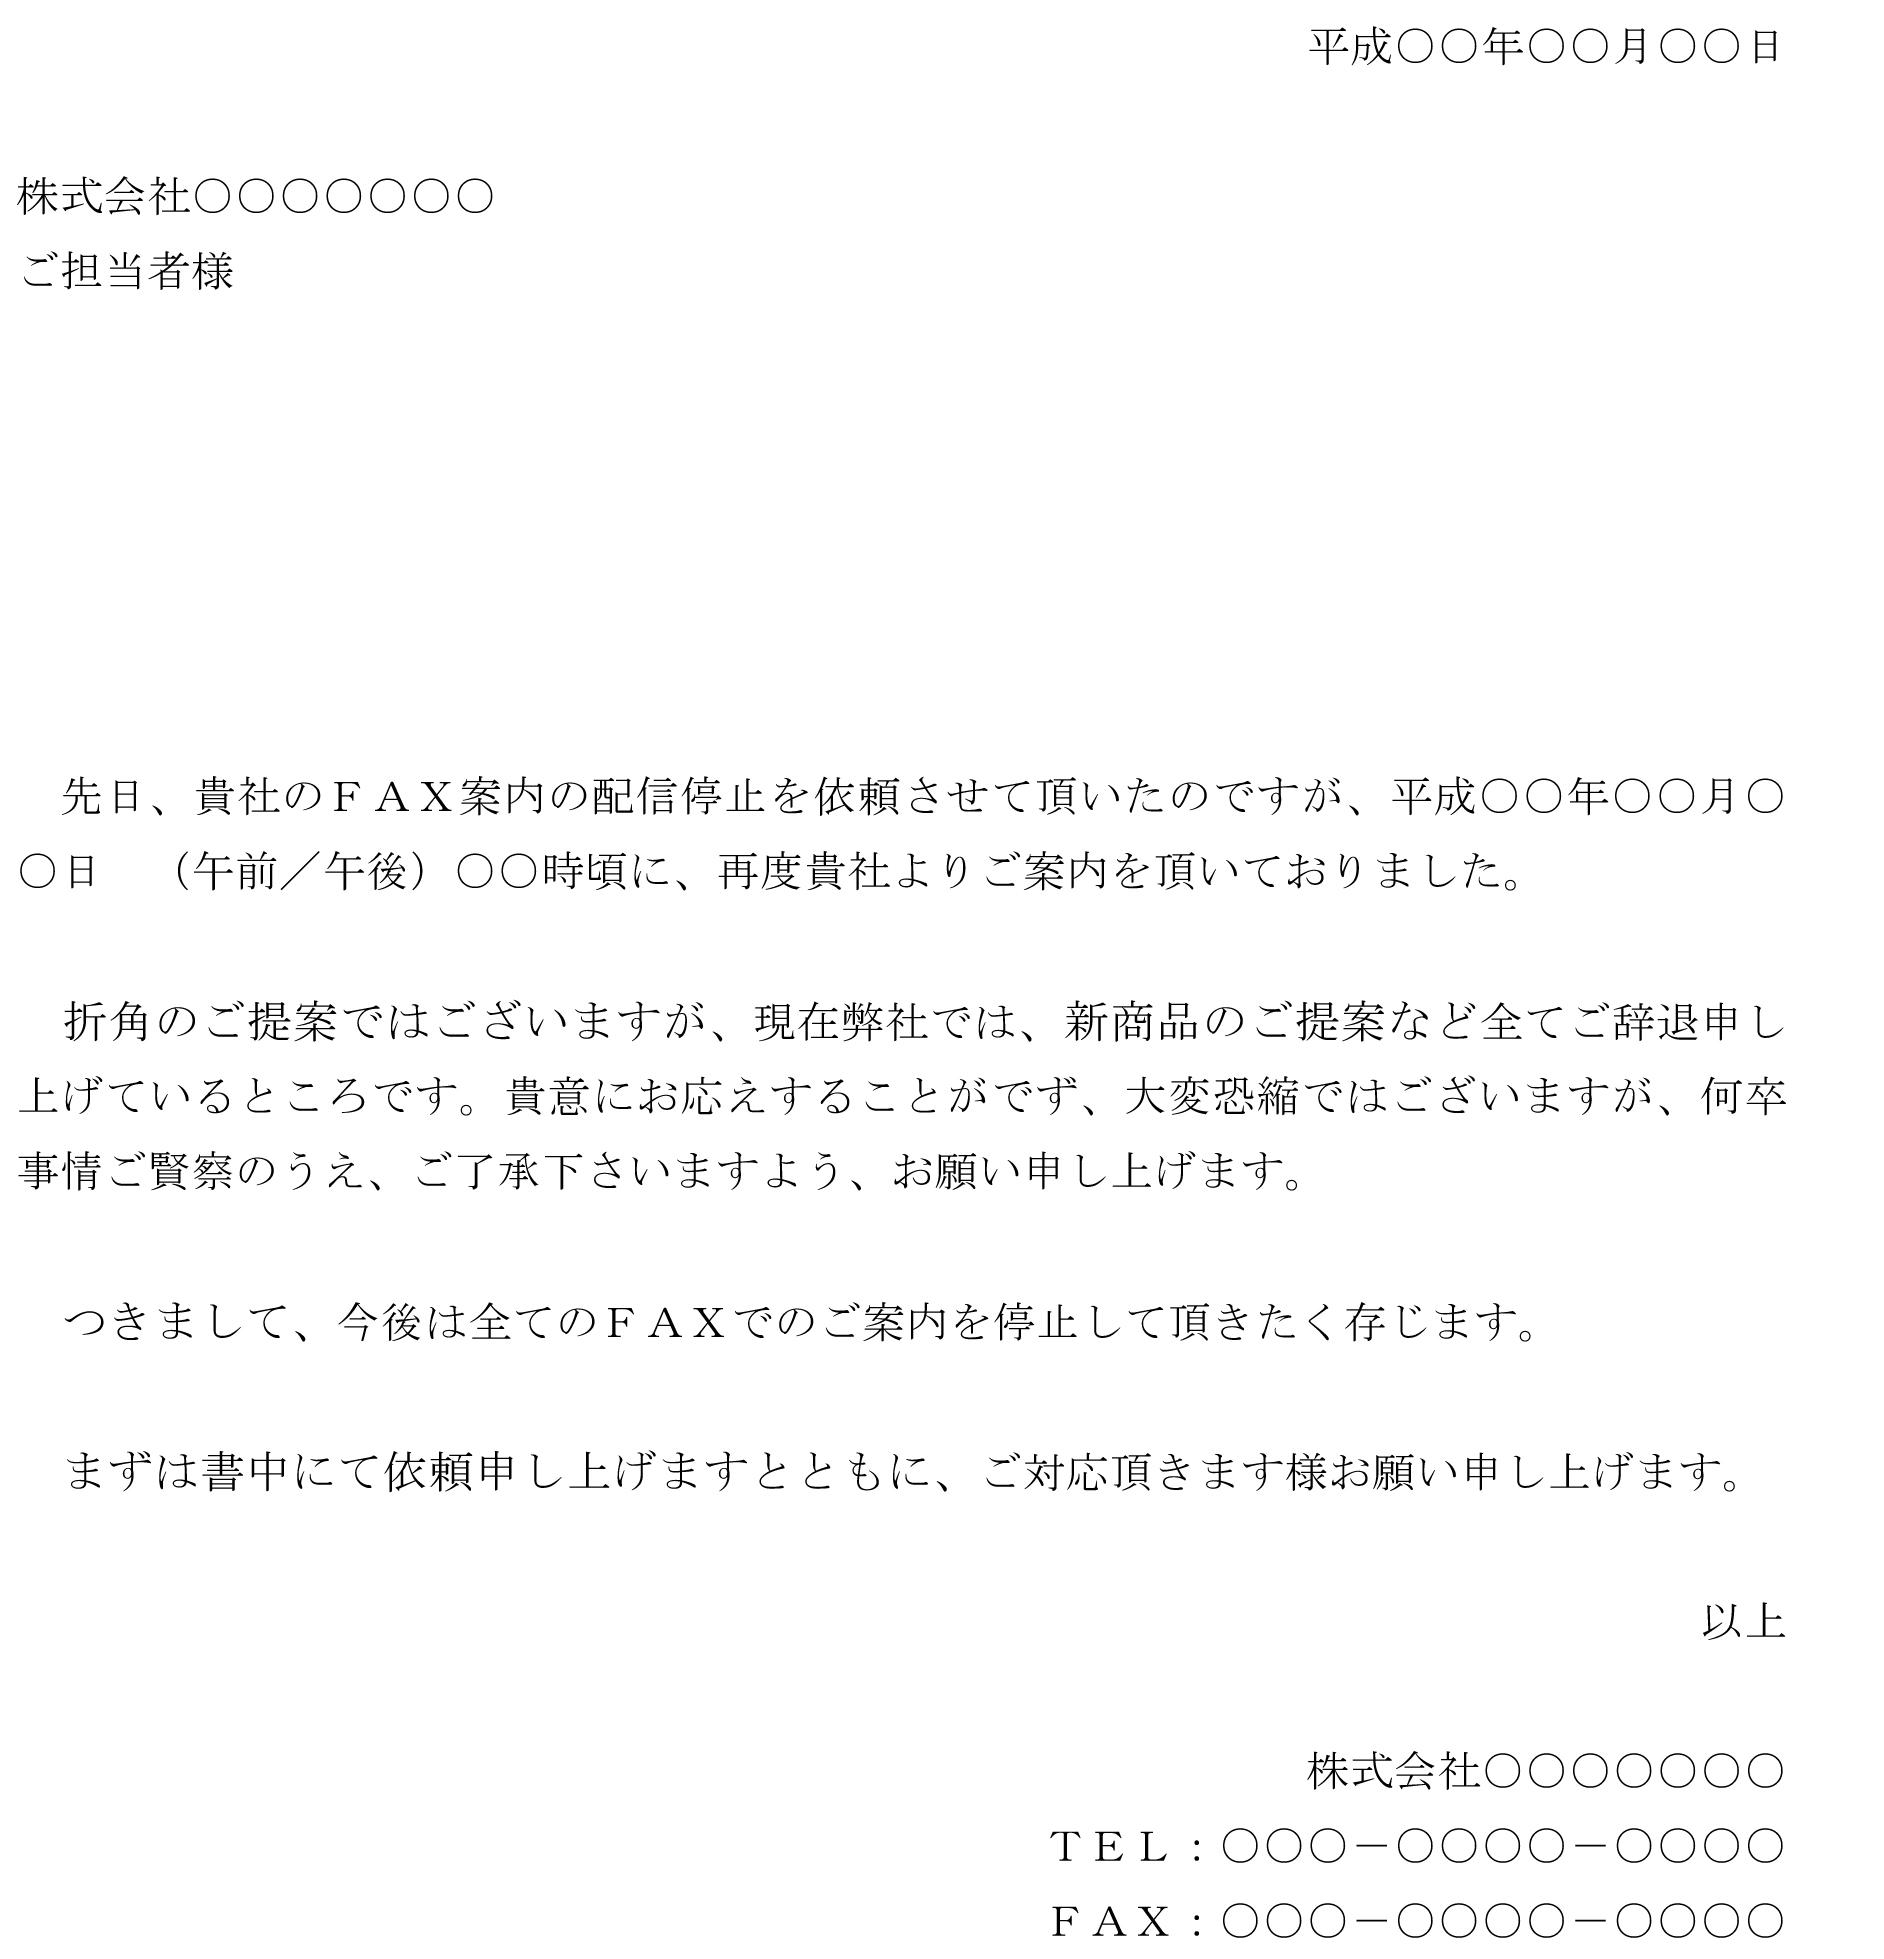 断り状(FAX配信停止)_4